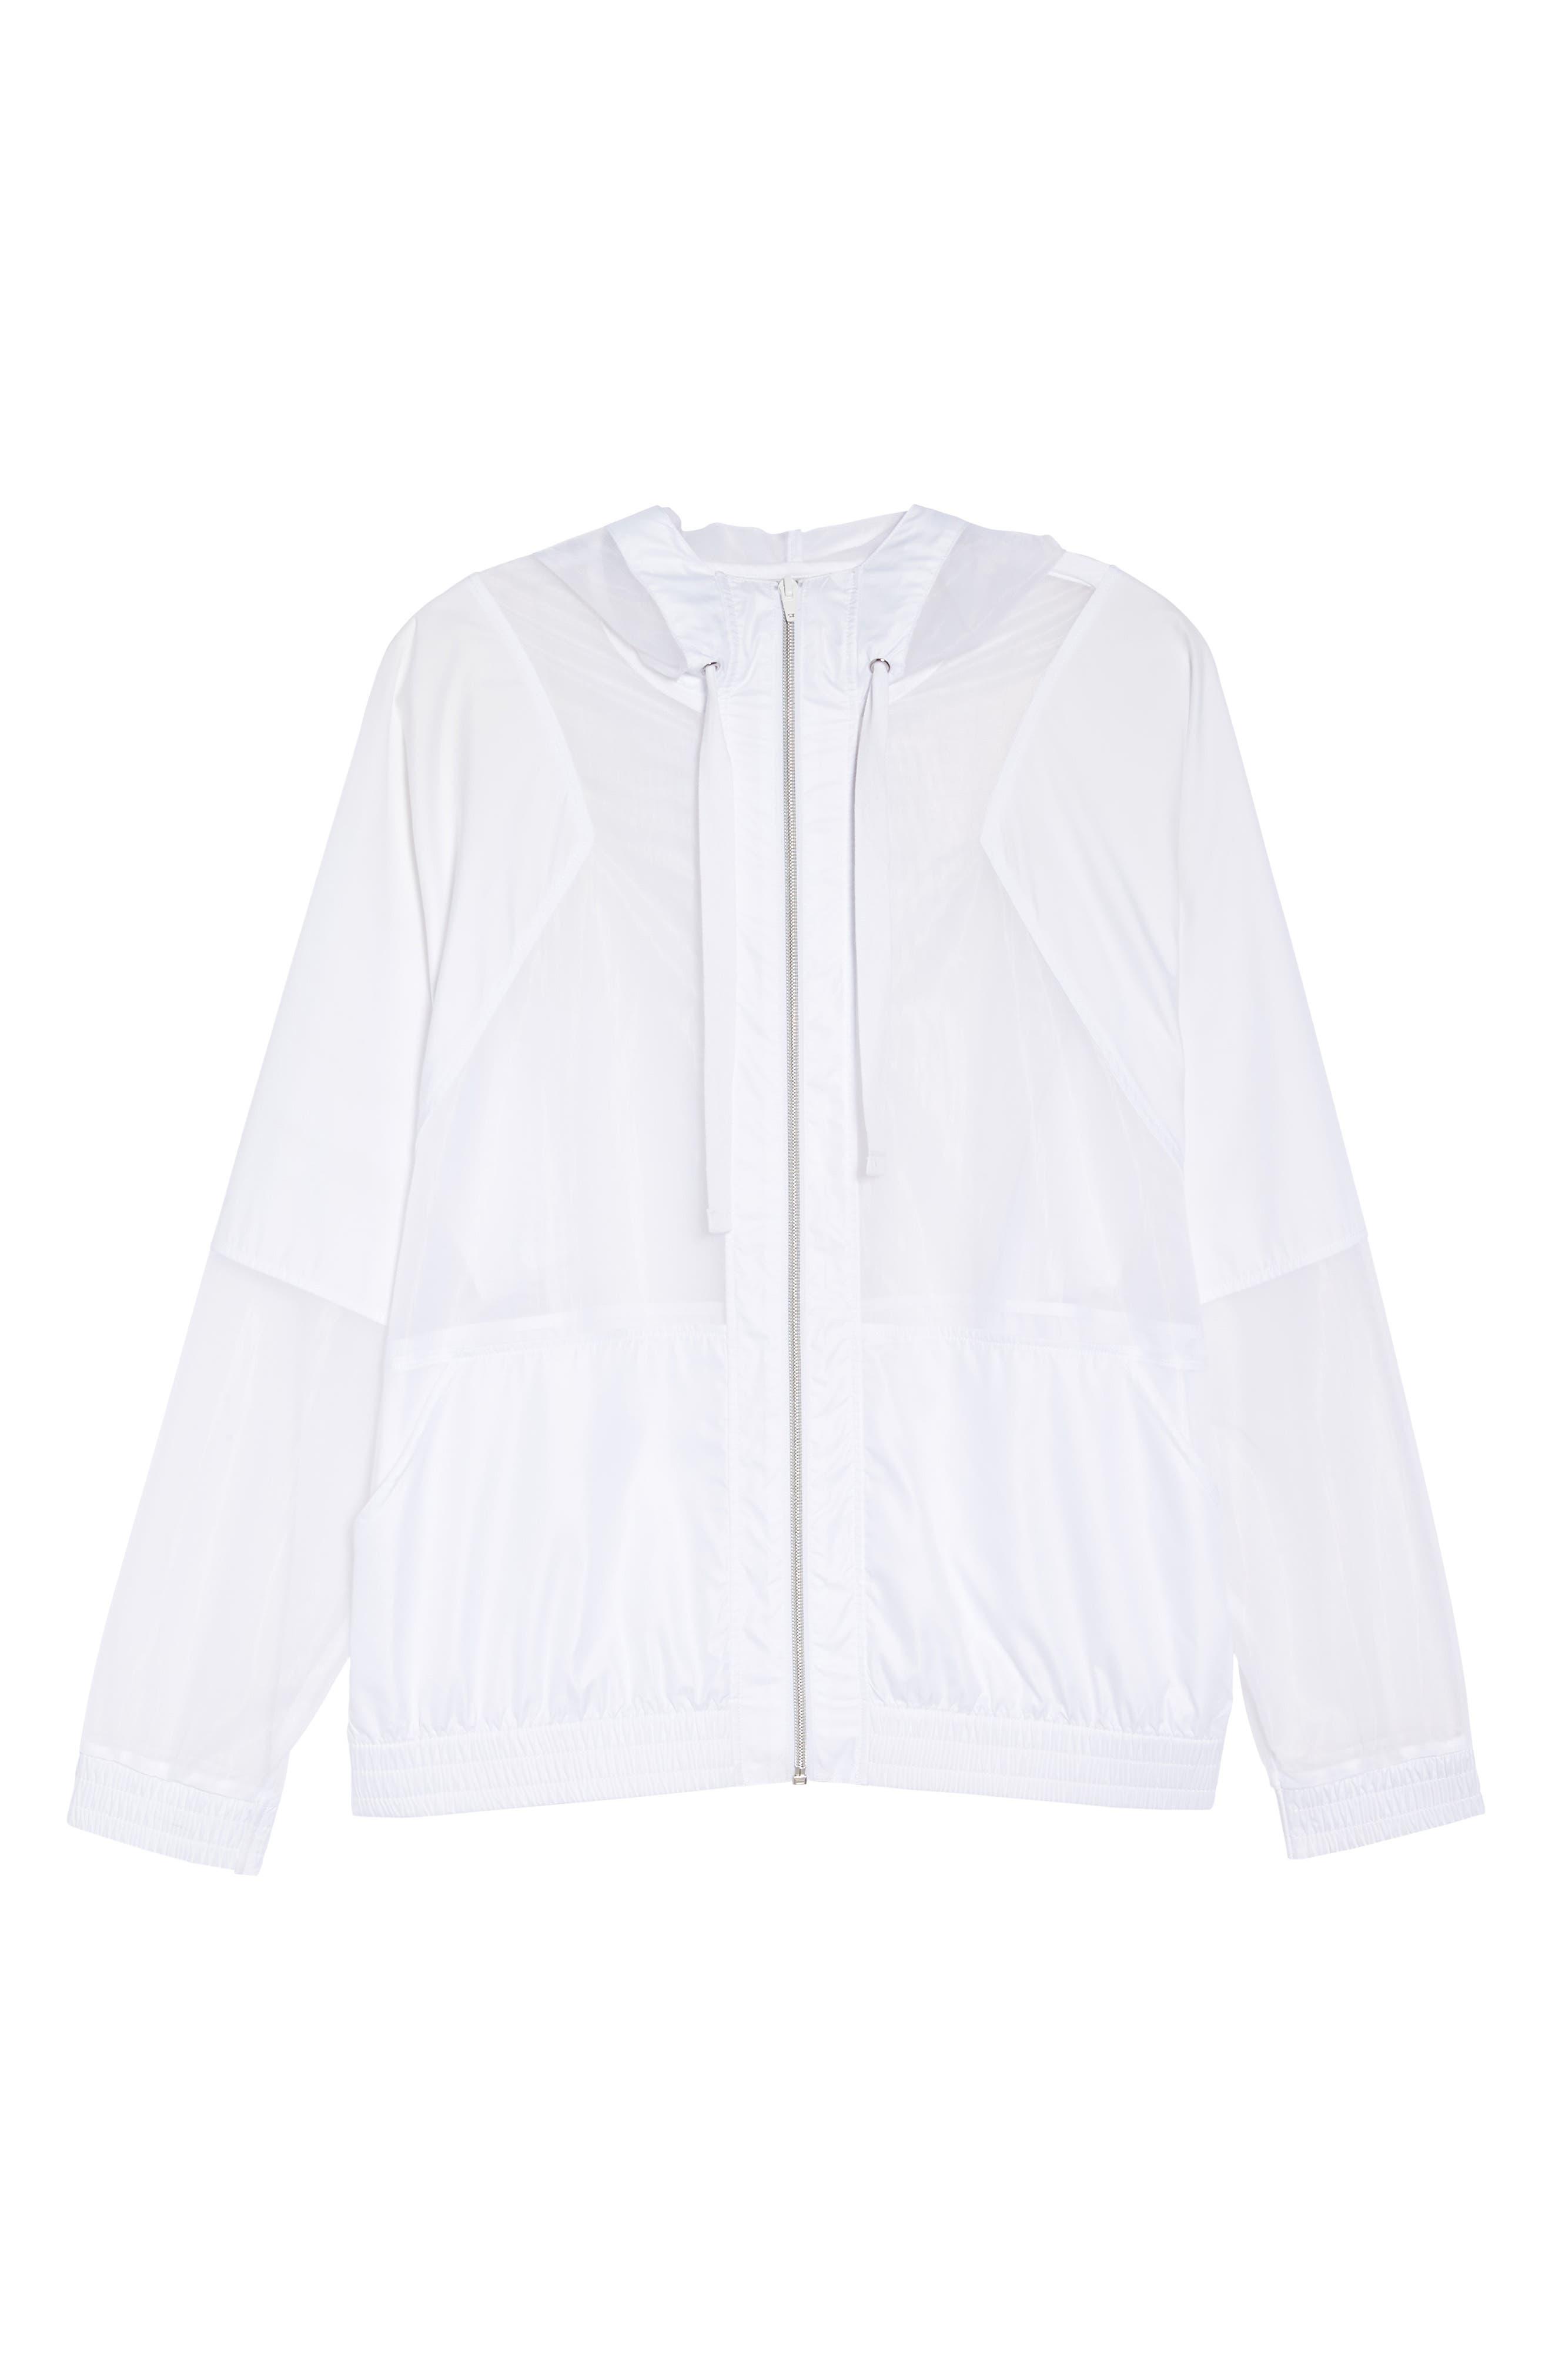 Sheer Mix Jacket,                             Alternate thumbnail 7, color,                             White